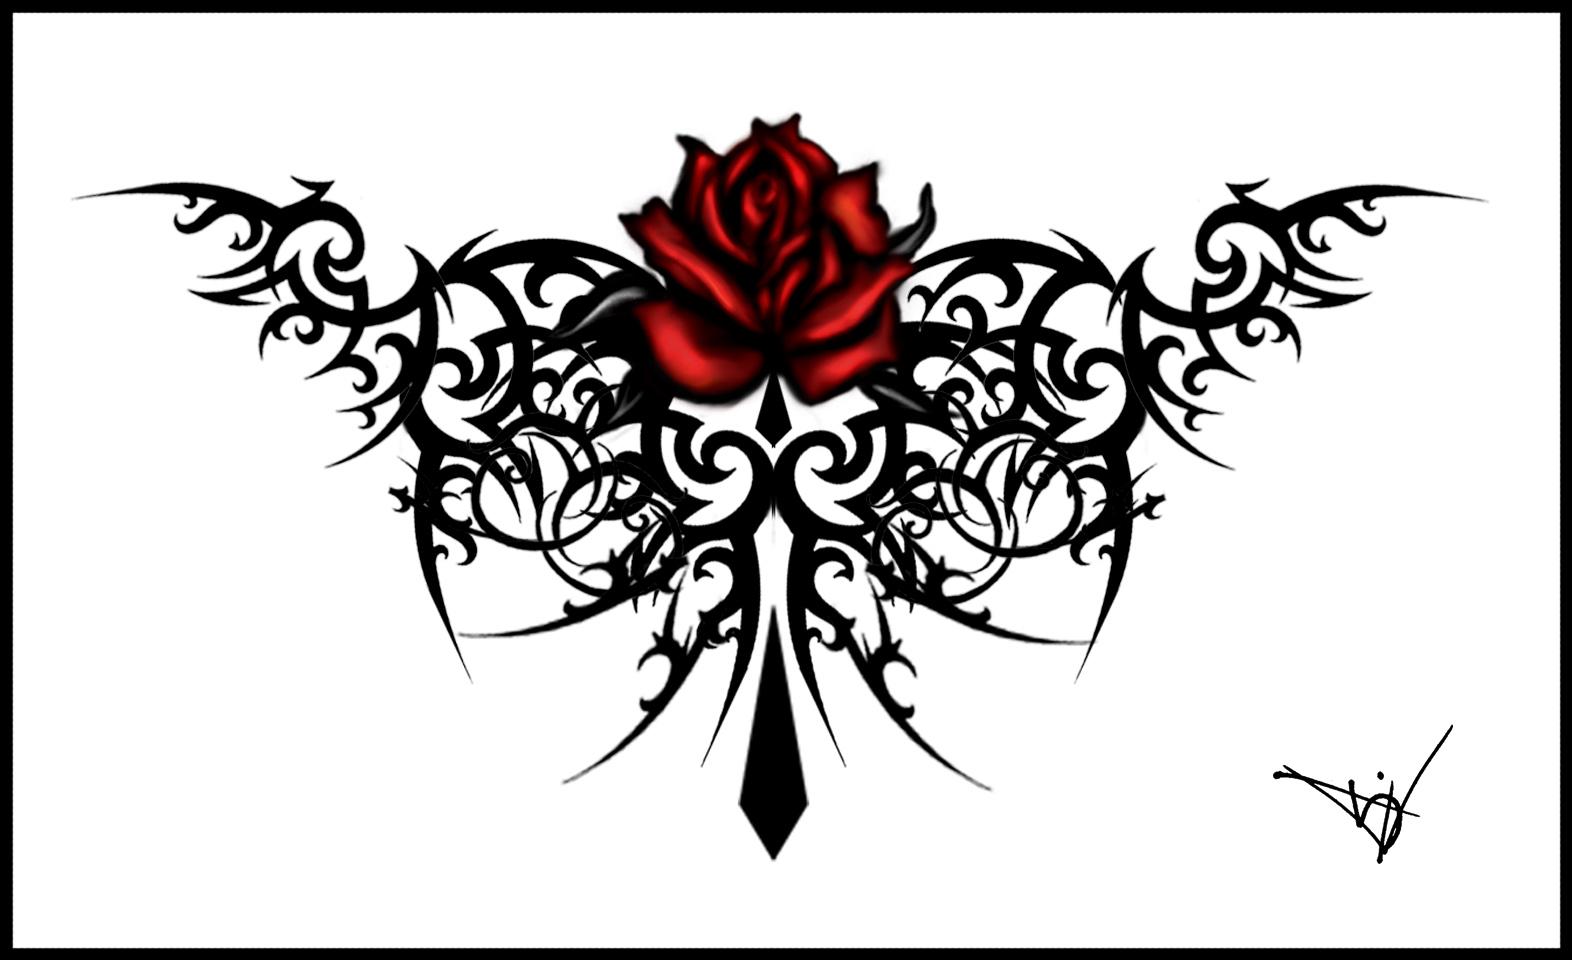 Tribal Rose Tattoo Designs Free Image